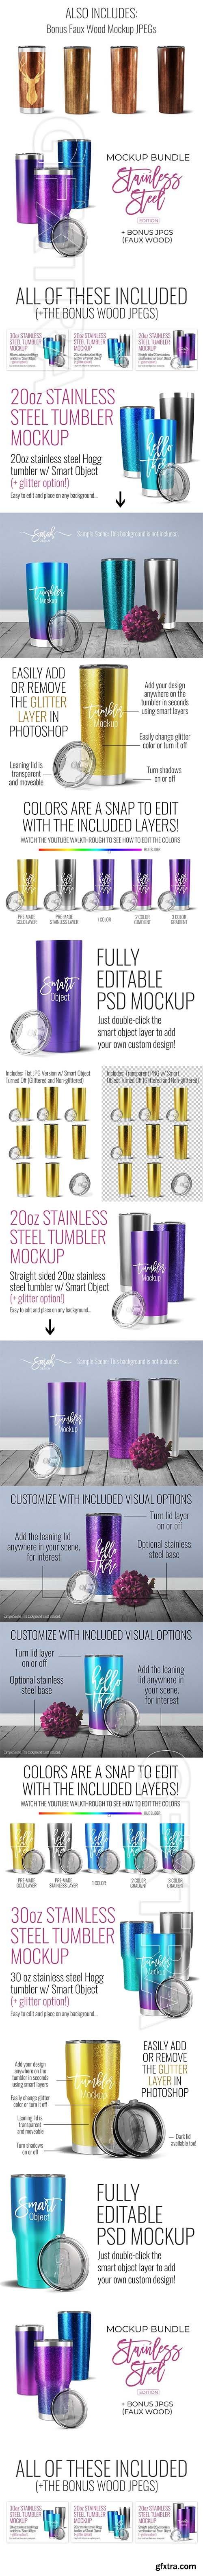 CreativeMarket - Stainless Tumbler Mockup Bundle 2578366